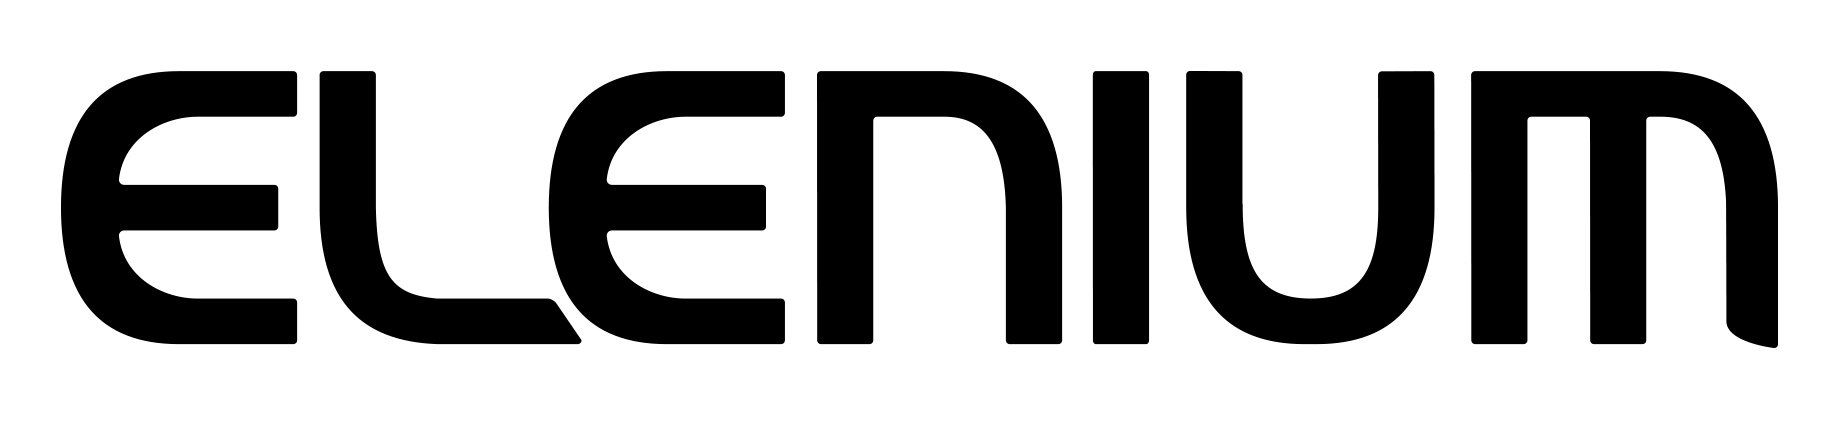 Ilves-Verkosto - Elenium Oy